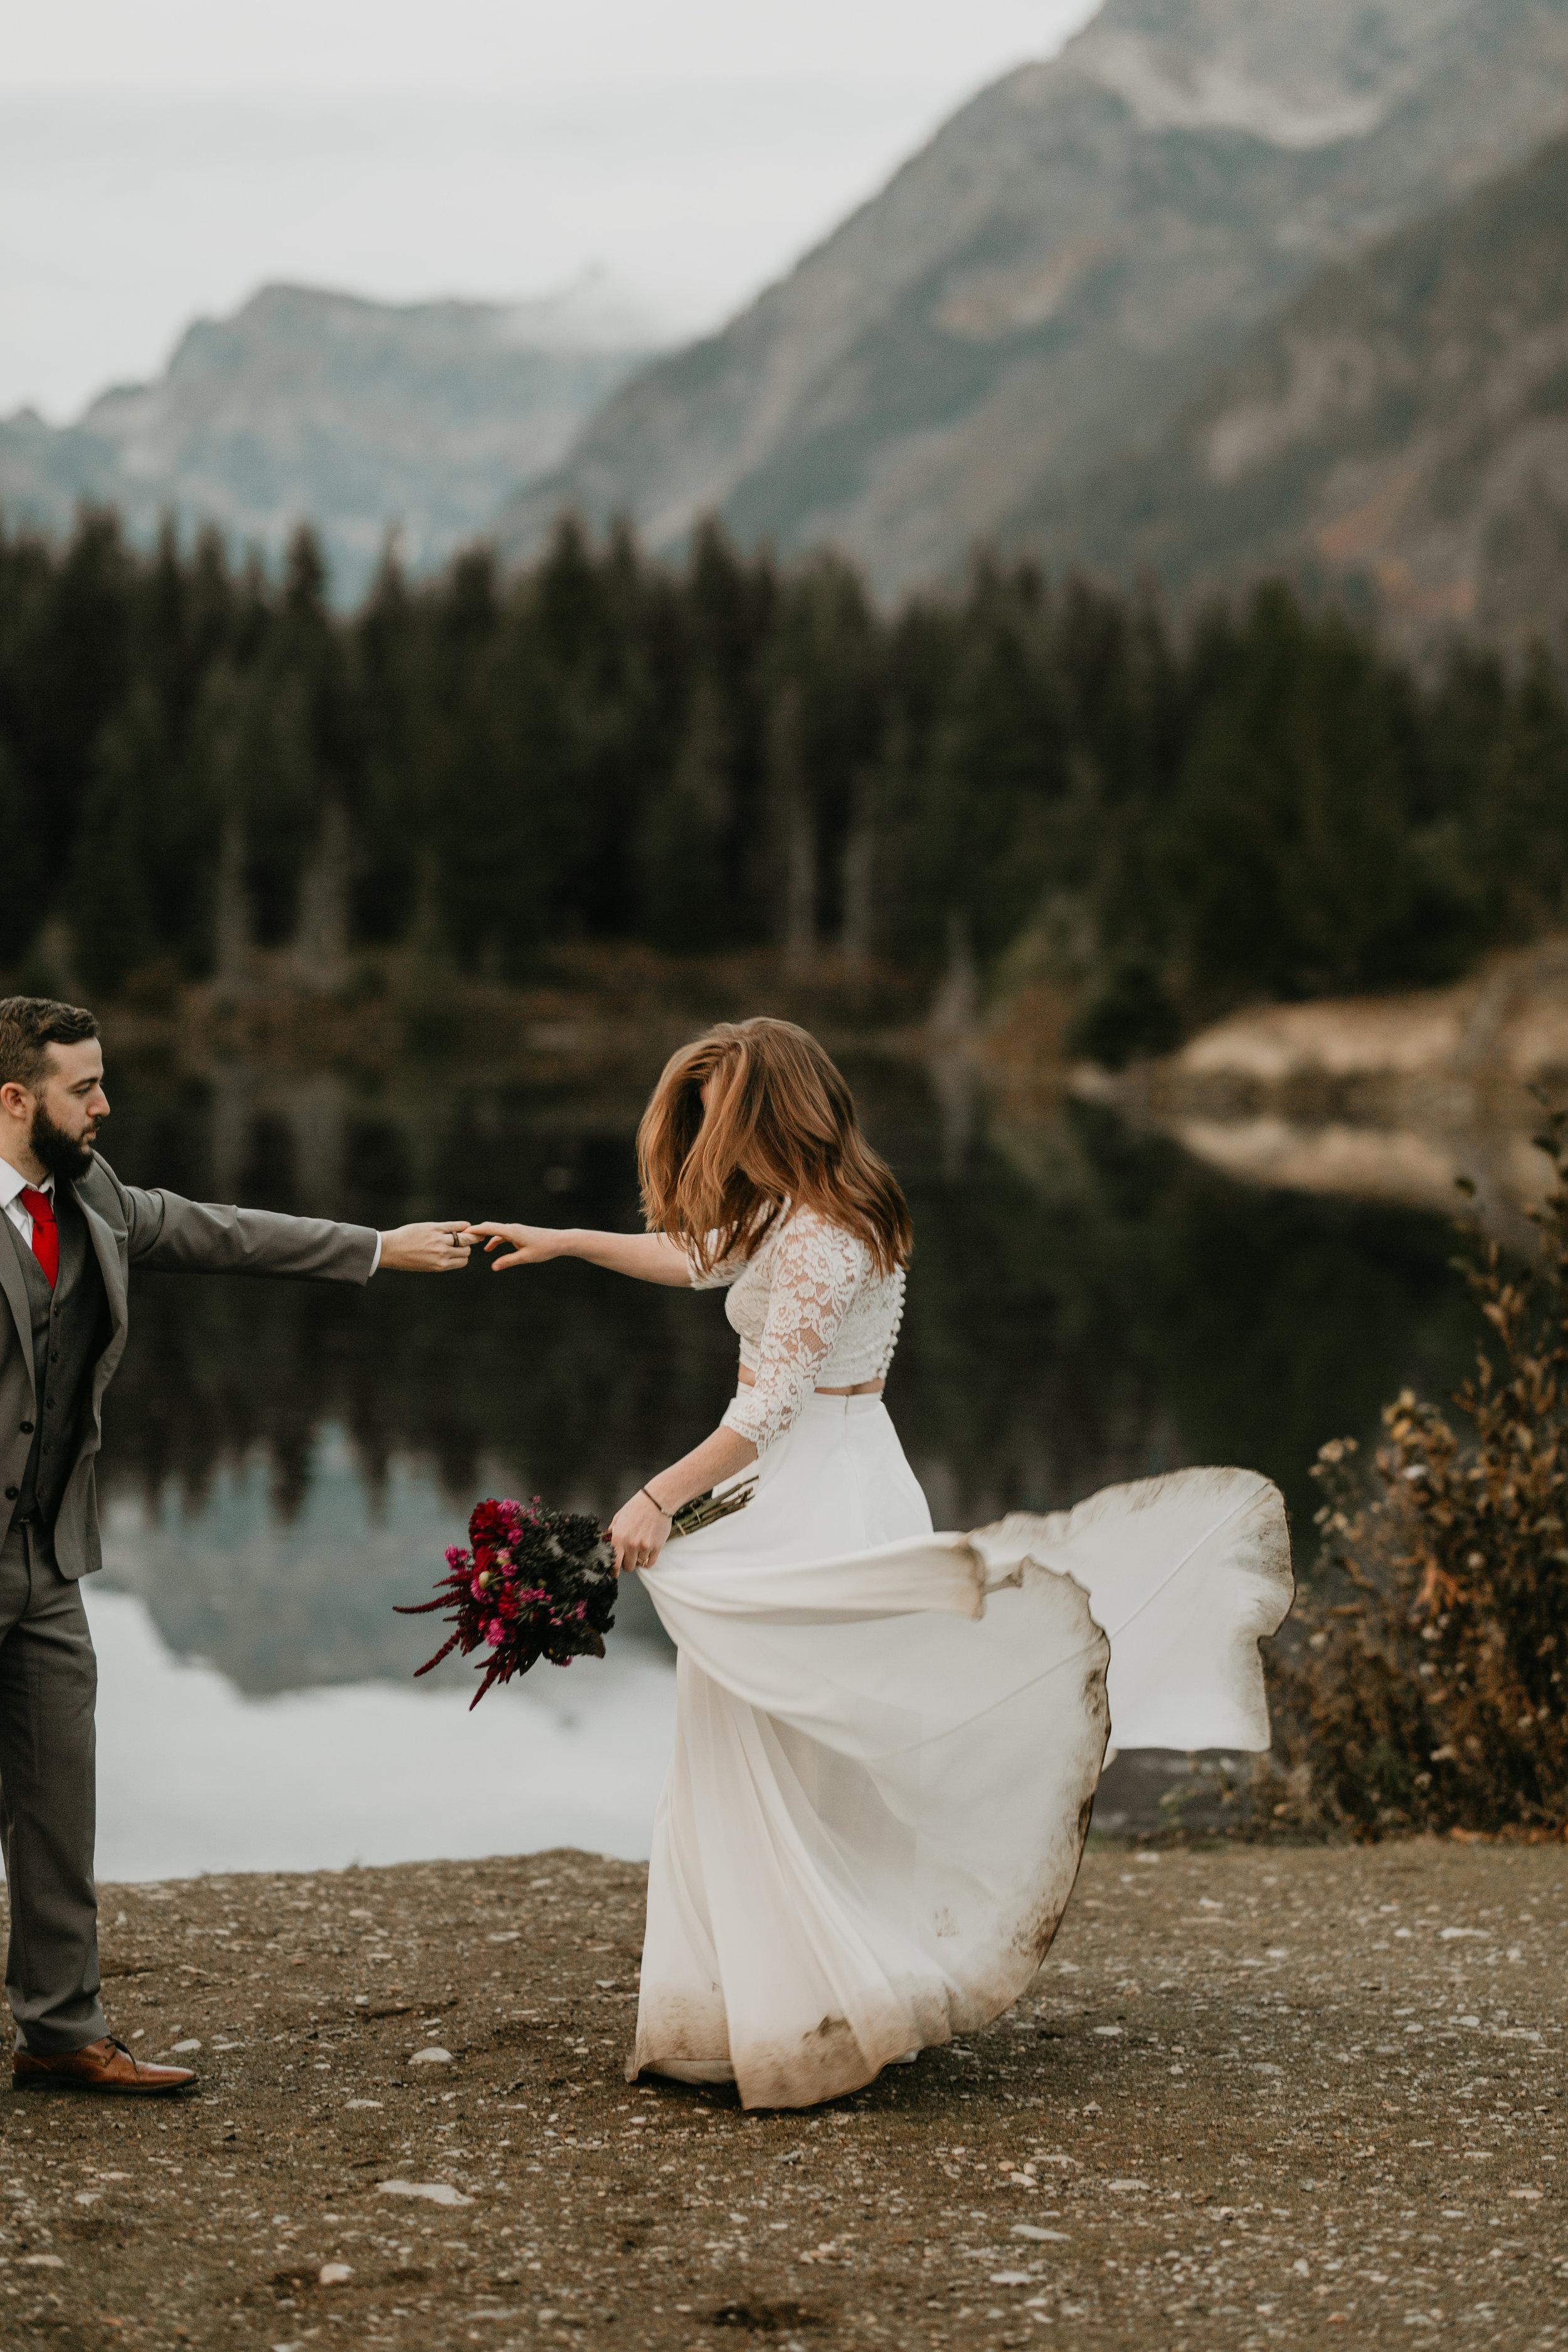 nicole-daacke-photography-mountain-view-elopement-at-gold-creek-pond-snoqualmie-washington-wa-elopement-photographer-photography-adventure-elopement-in-washington-fall-lakeside-golden-sunset-boho-fun-bride-2851.jpg